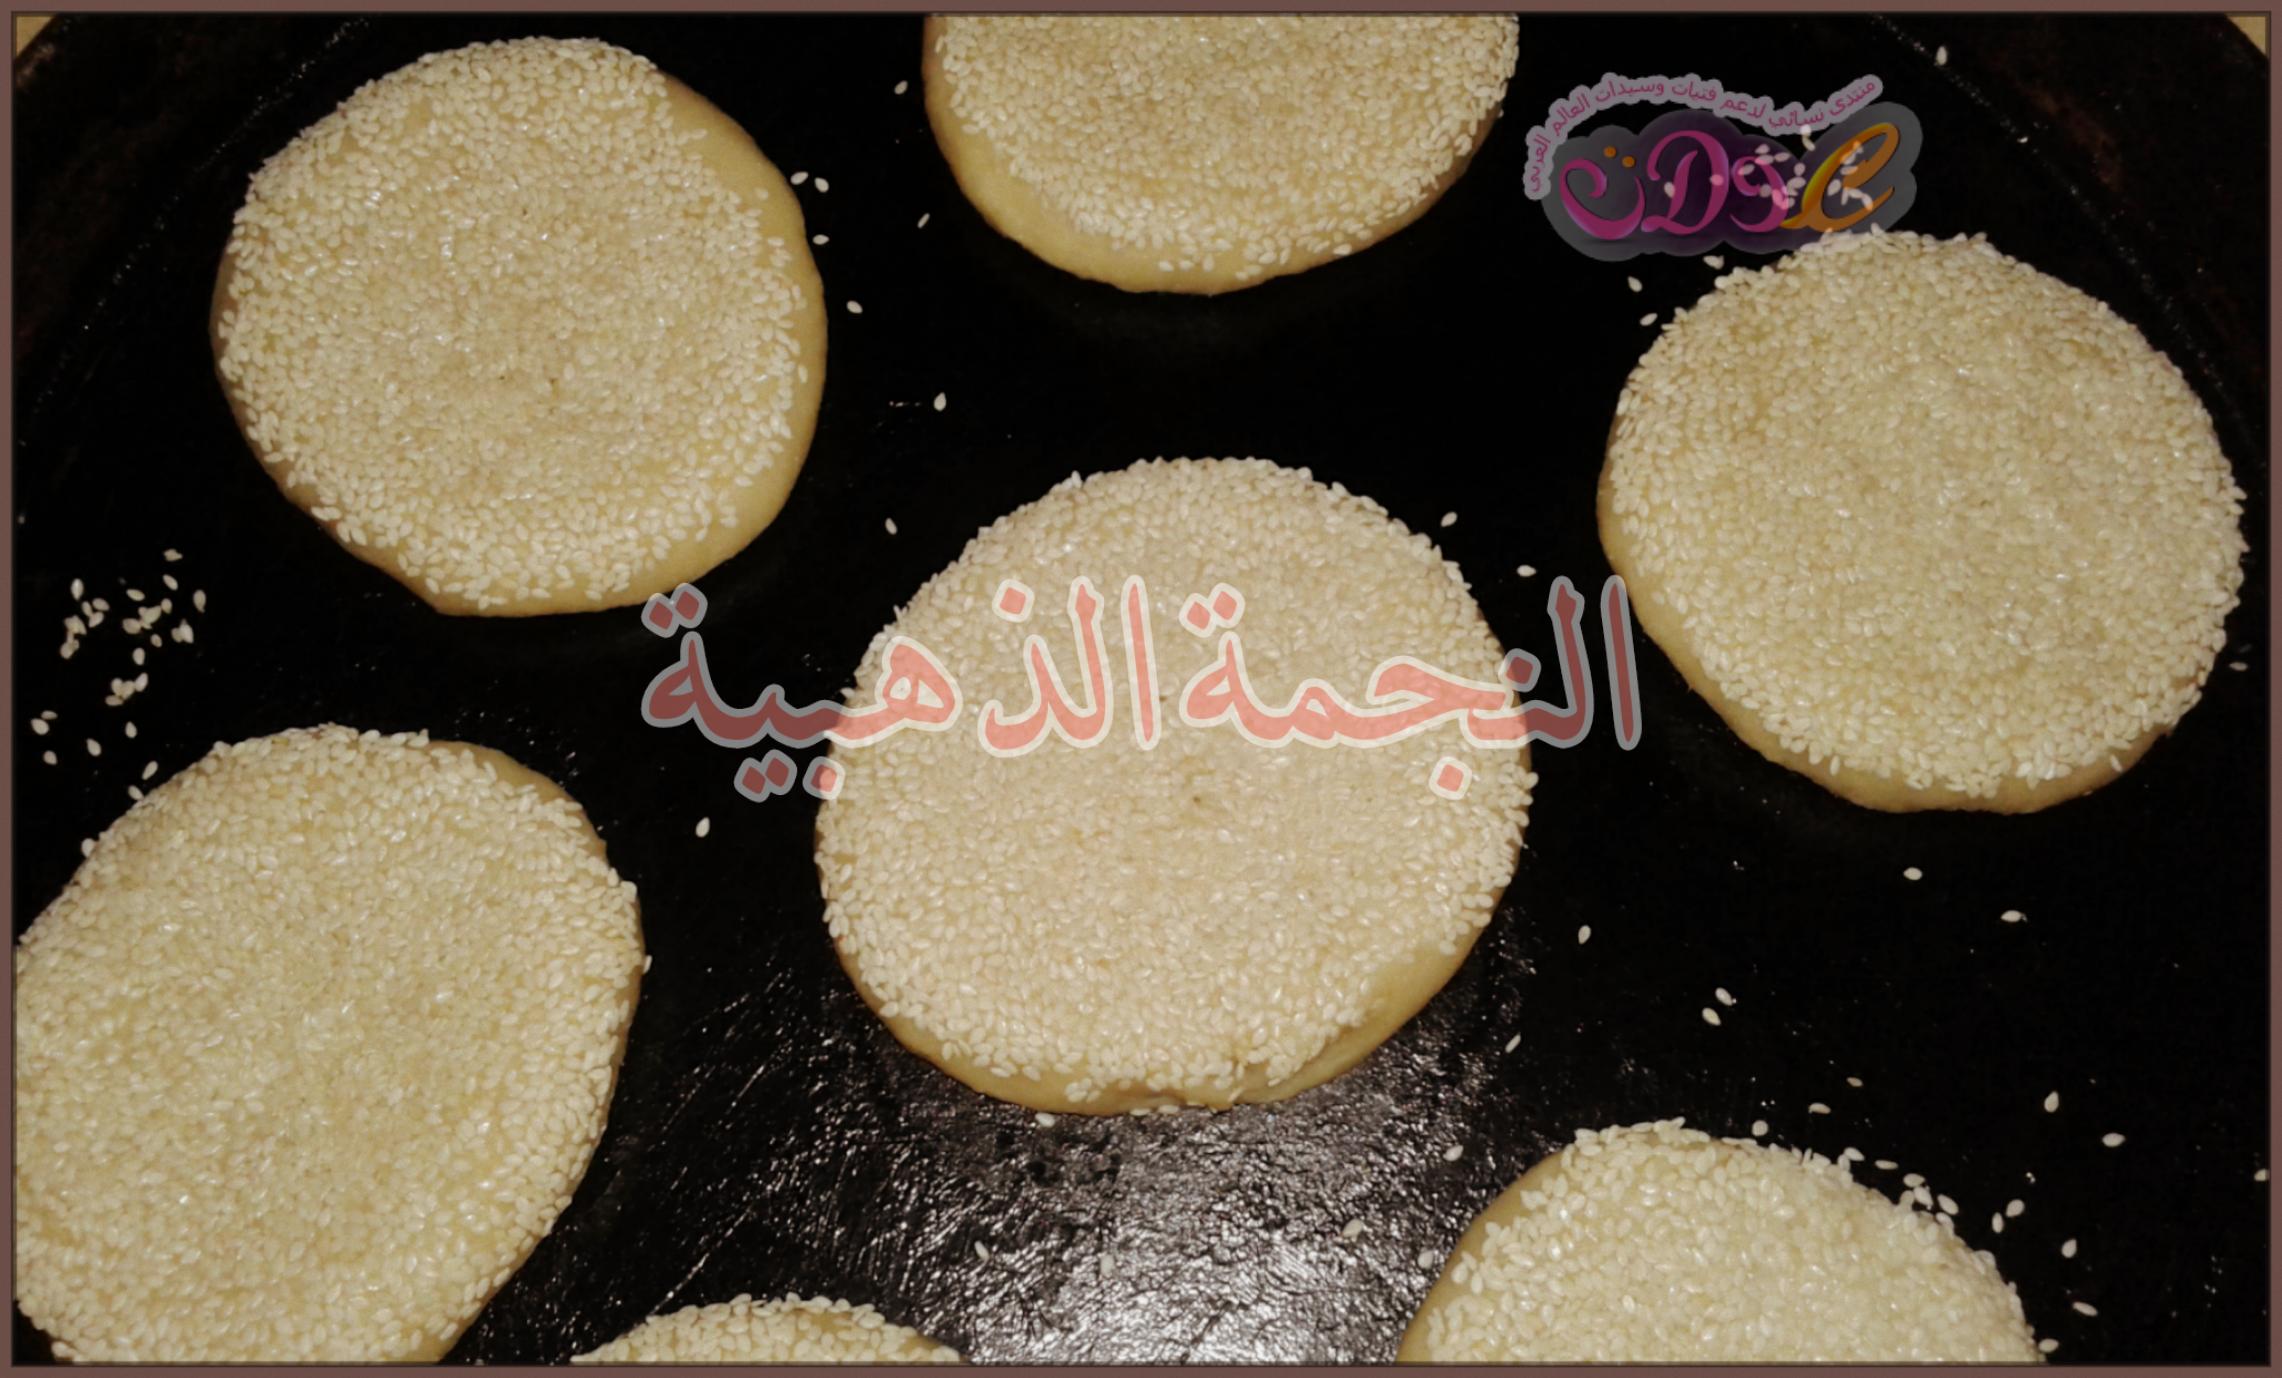 مطبخي] محشوه بالسكر .قرص بالسمسم لذيذه 3dlat.com_07_18_638e